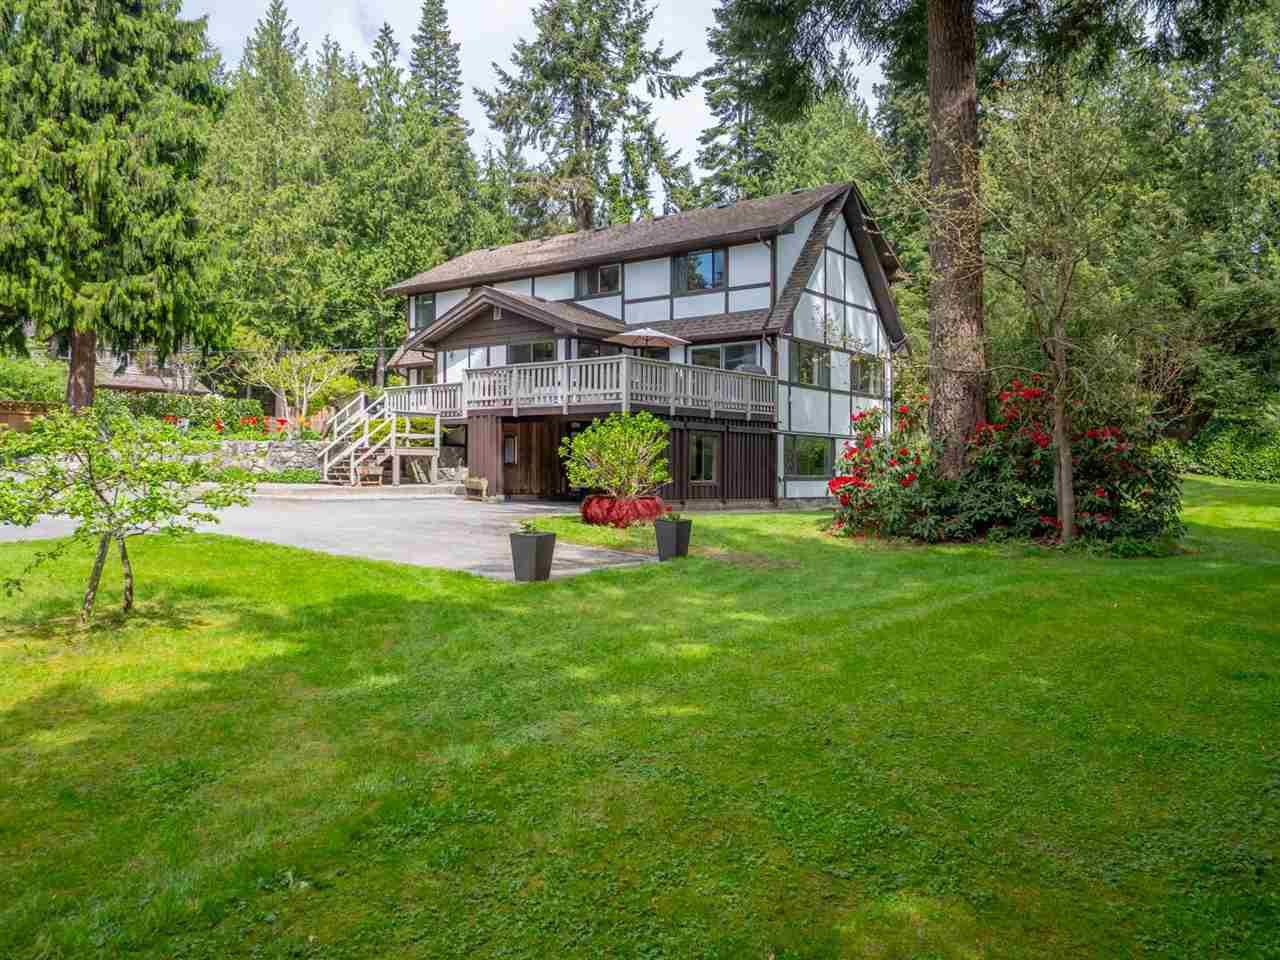 Main Photo: 1249 ROBERTS CREEK ROAD in Sechelt: Roberts Creek House for sale (Sunshine Coast)  : MLS®# R2267068